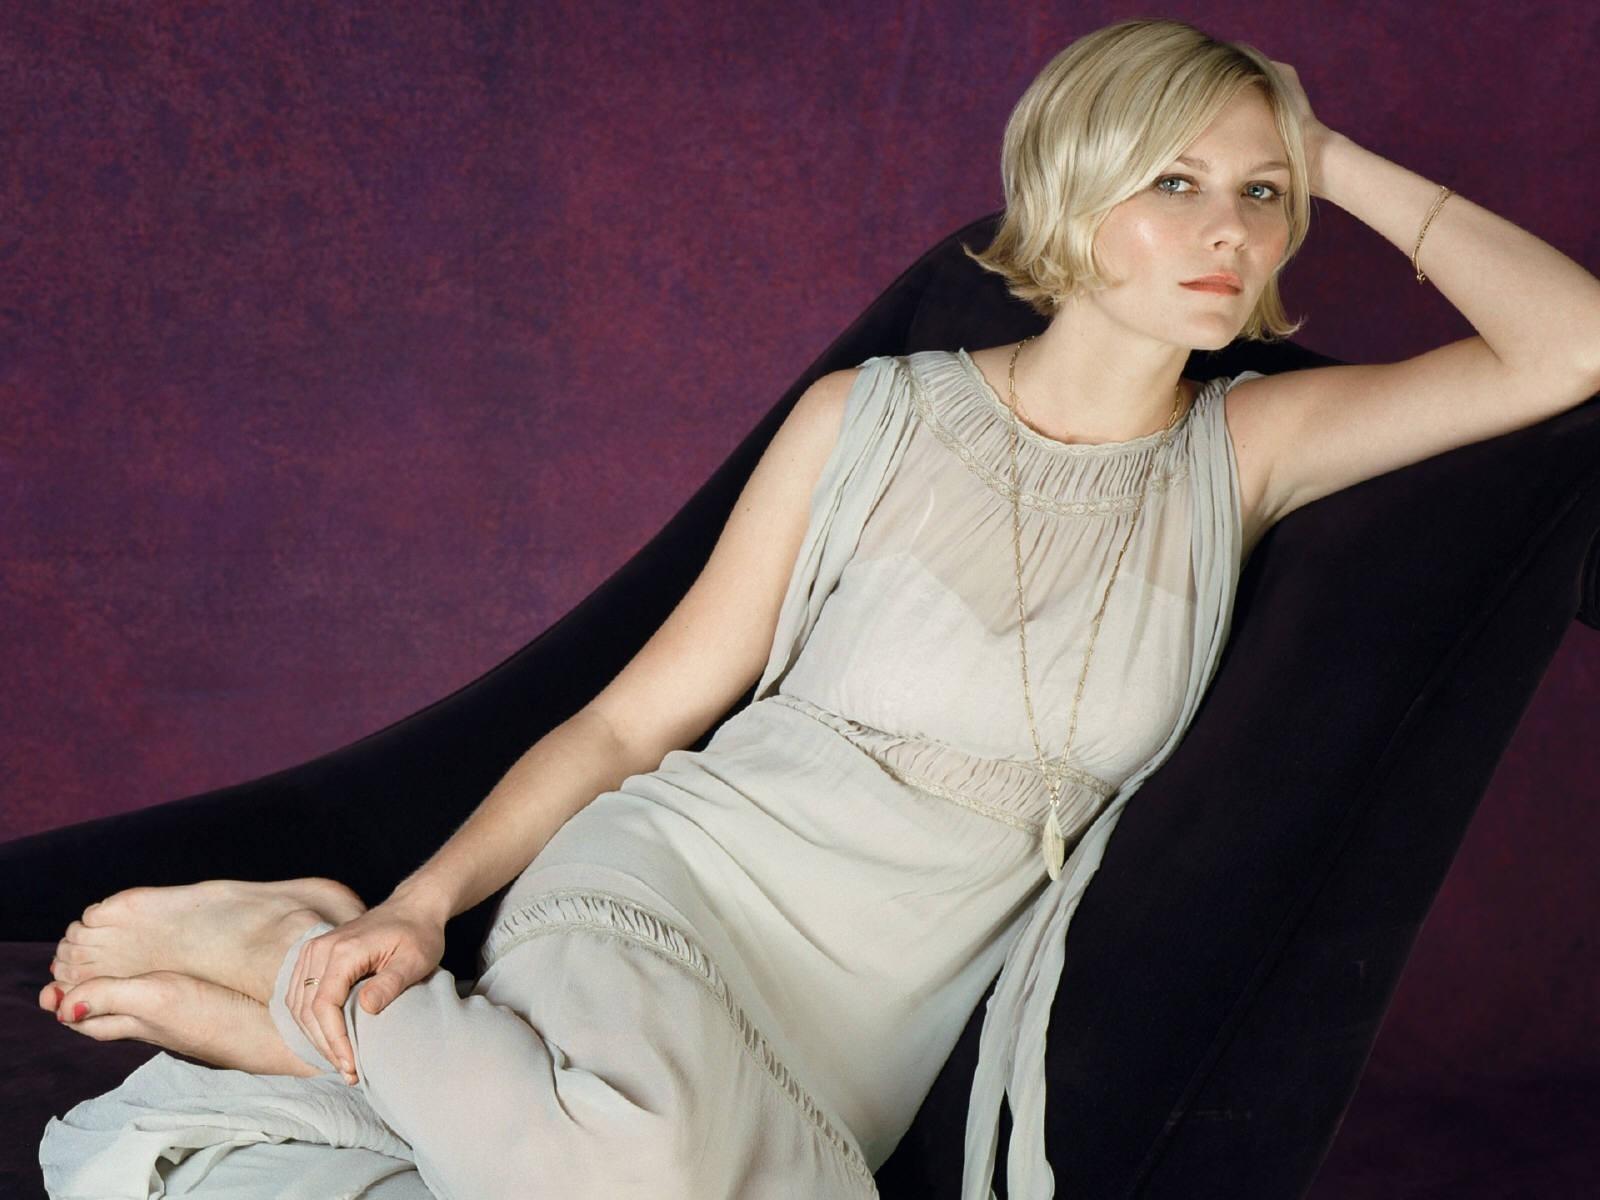 Wallpaper di Kirsten Dunst su fondo viola